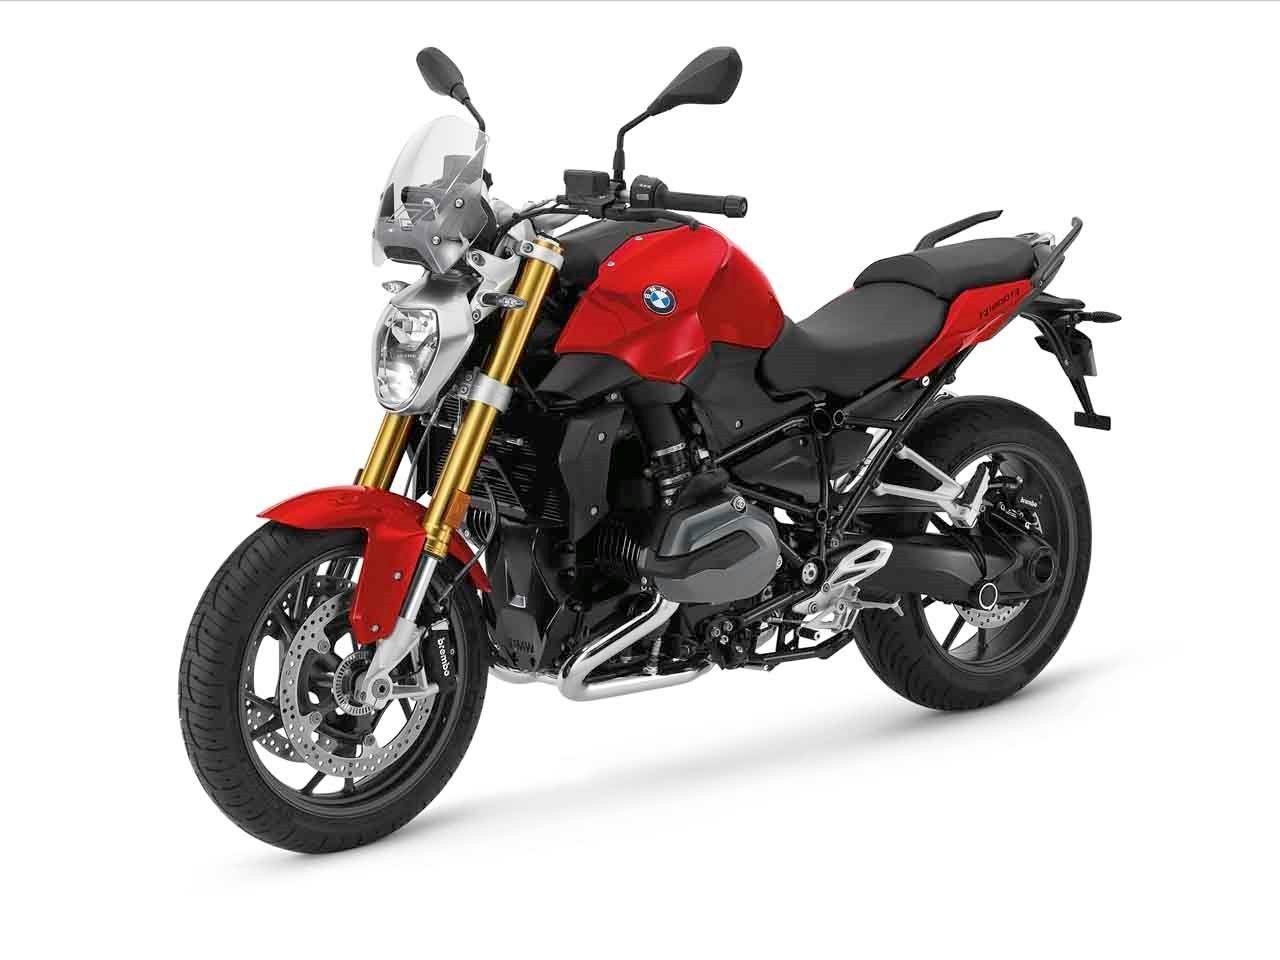 moto neuve acheter bmw r 1200 r abs arrigoni sport gmbh. Black Bedroom Furniture Sets. Home Design Ideas